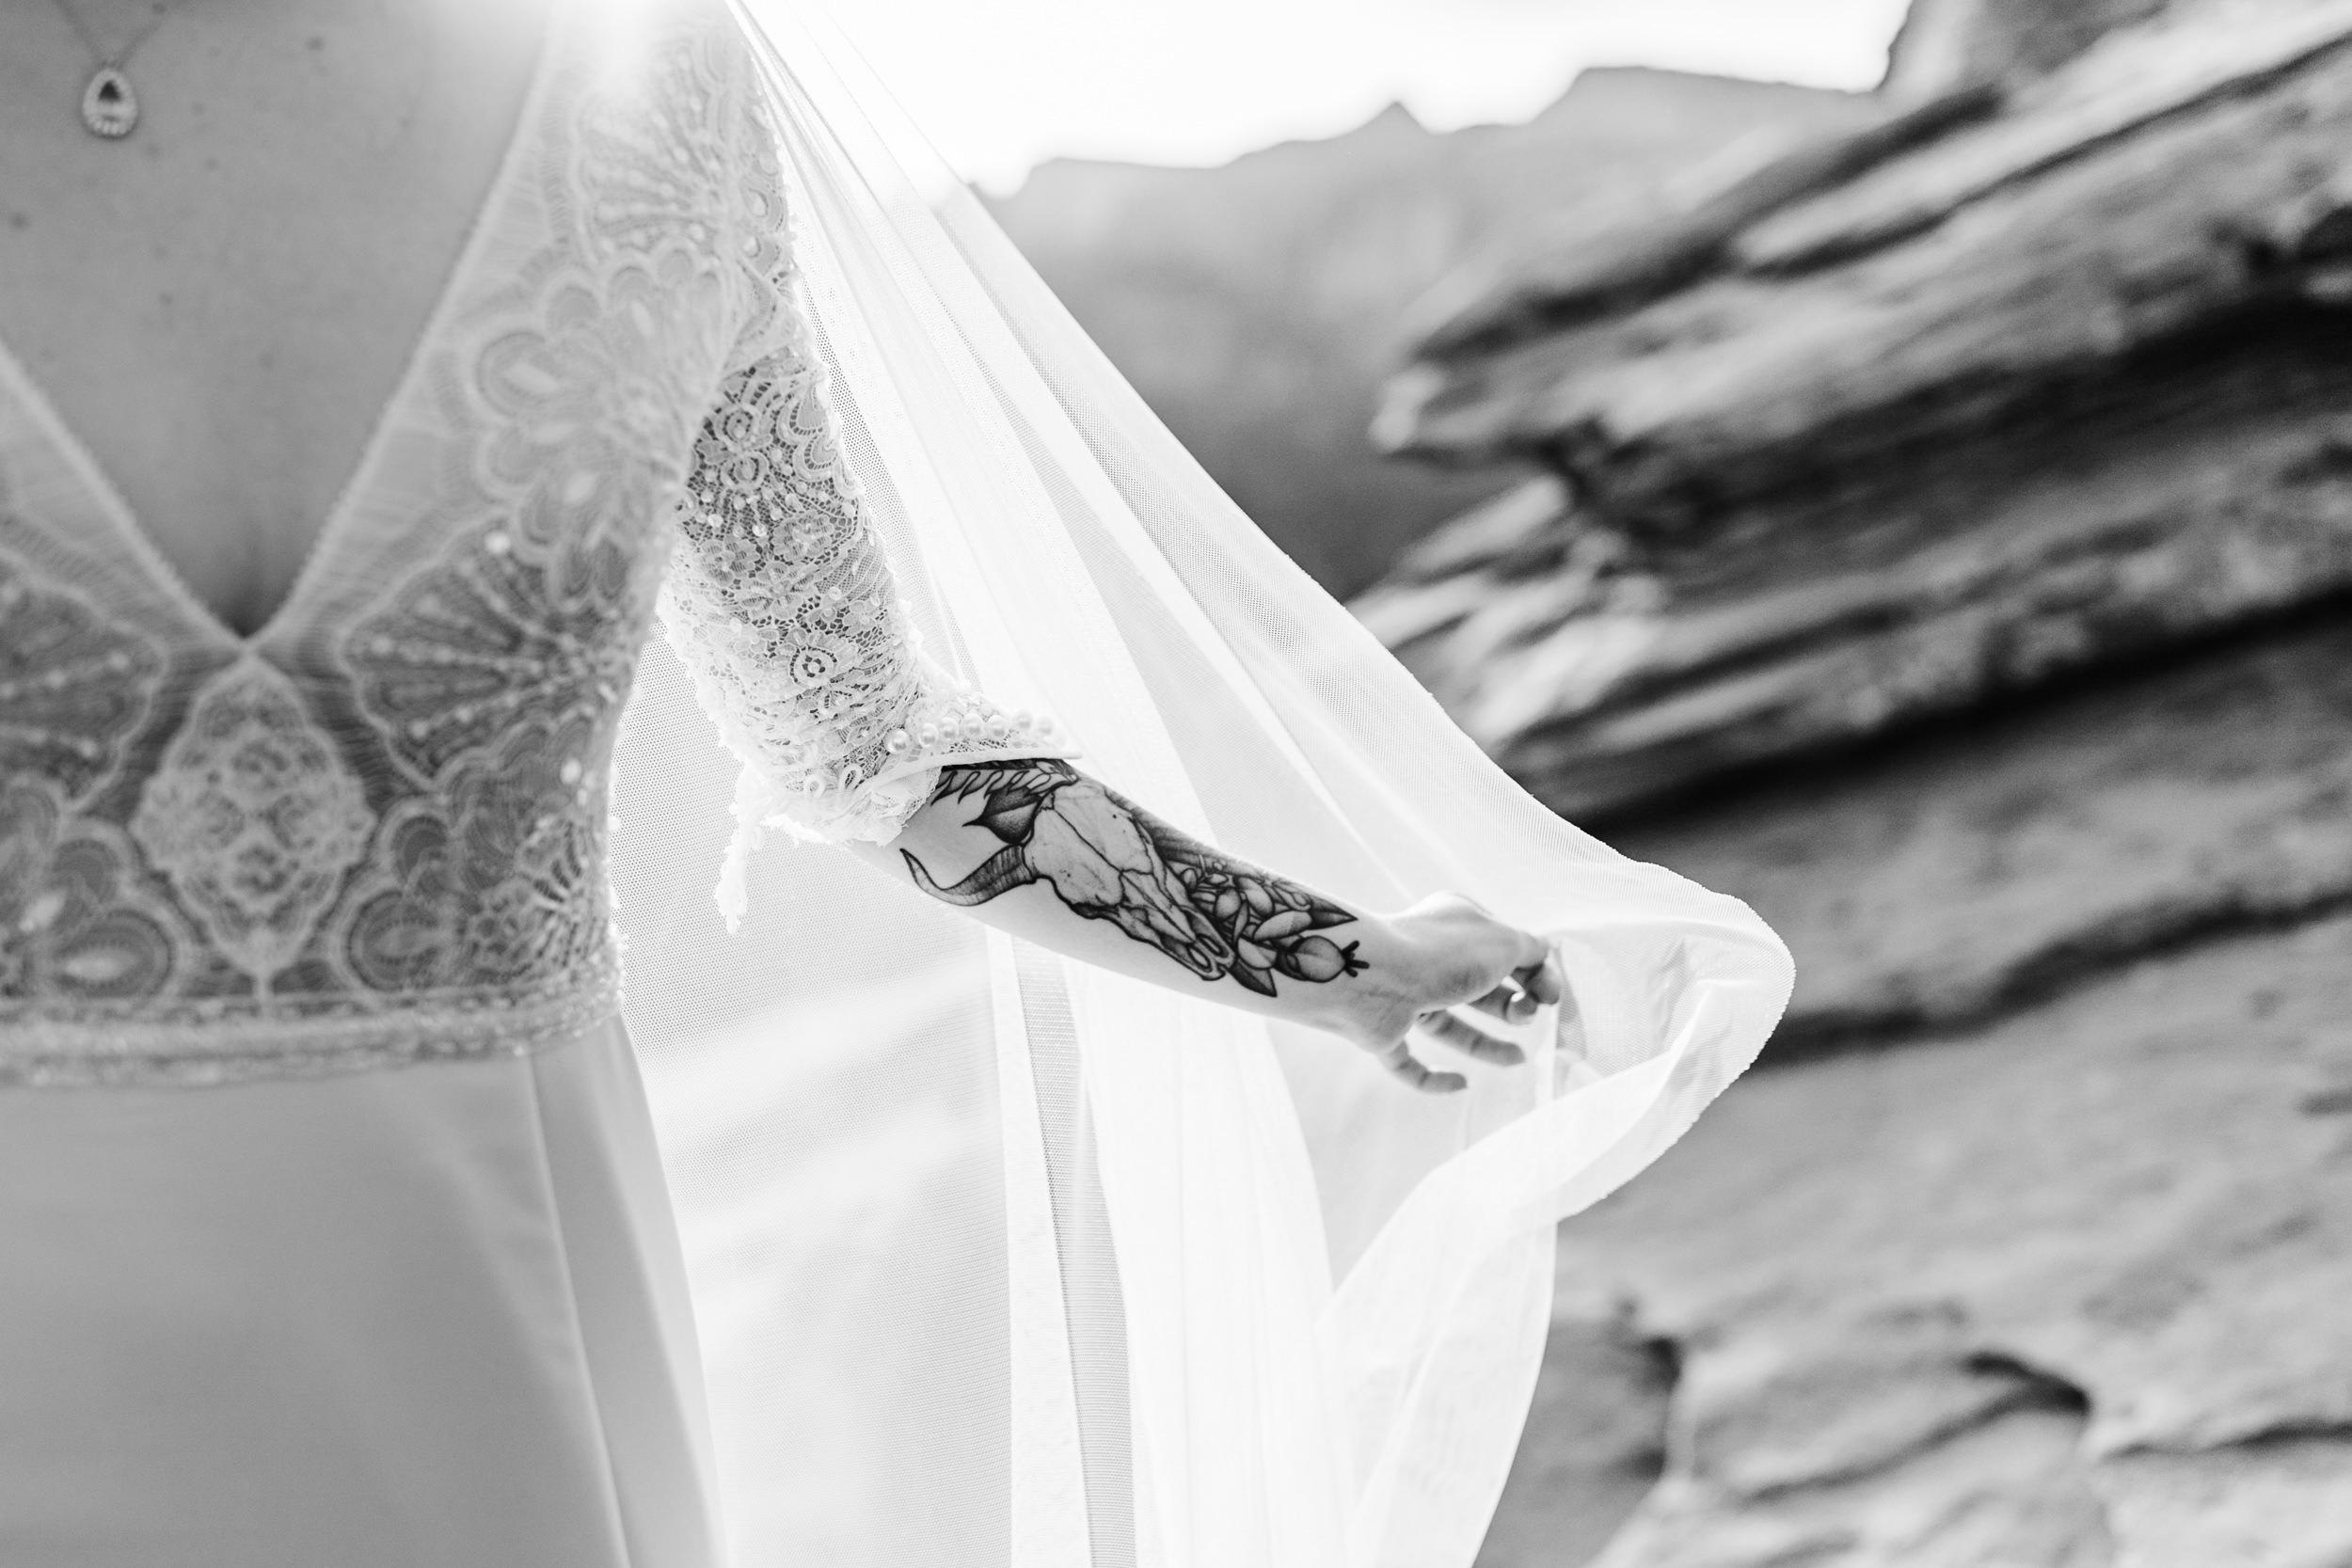 Zion-National-Park-Adventure-Wedding-Hearnes-Elopement-Photography-41.jpg